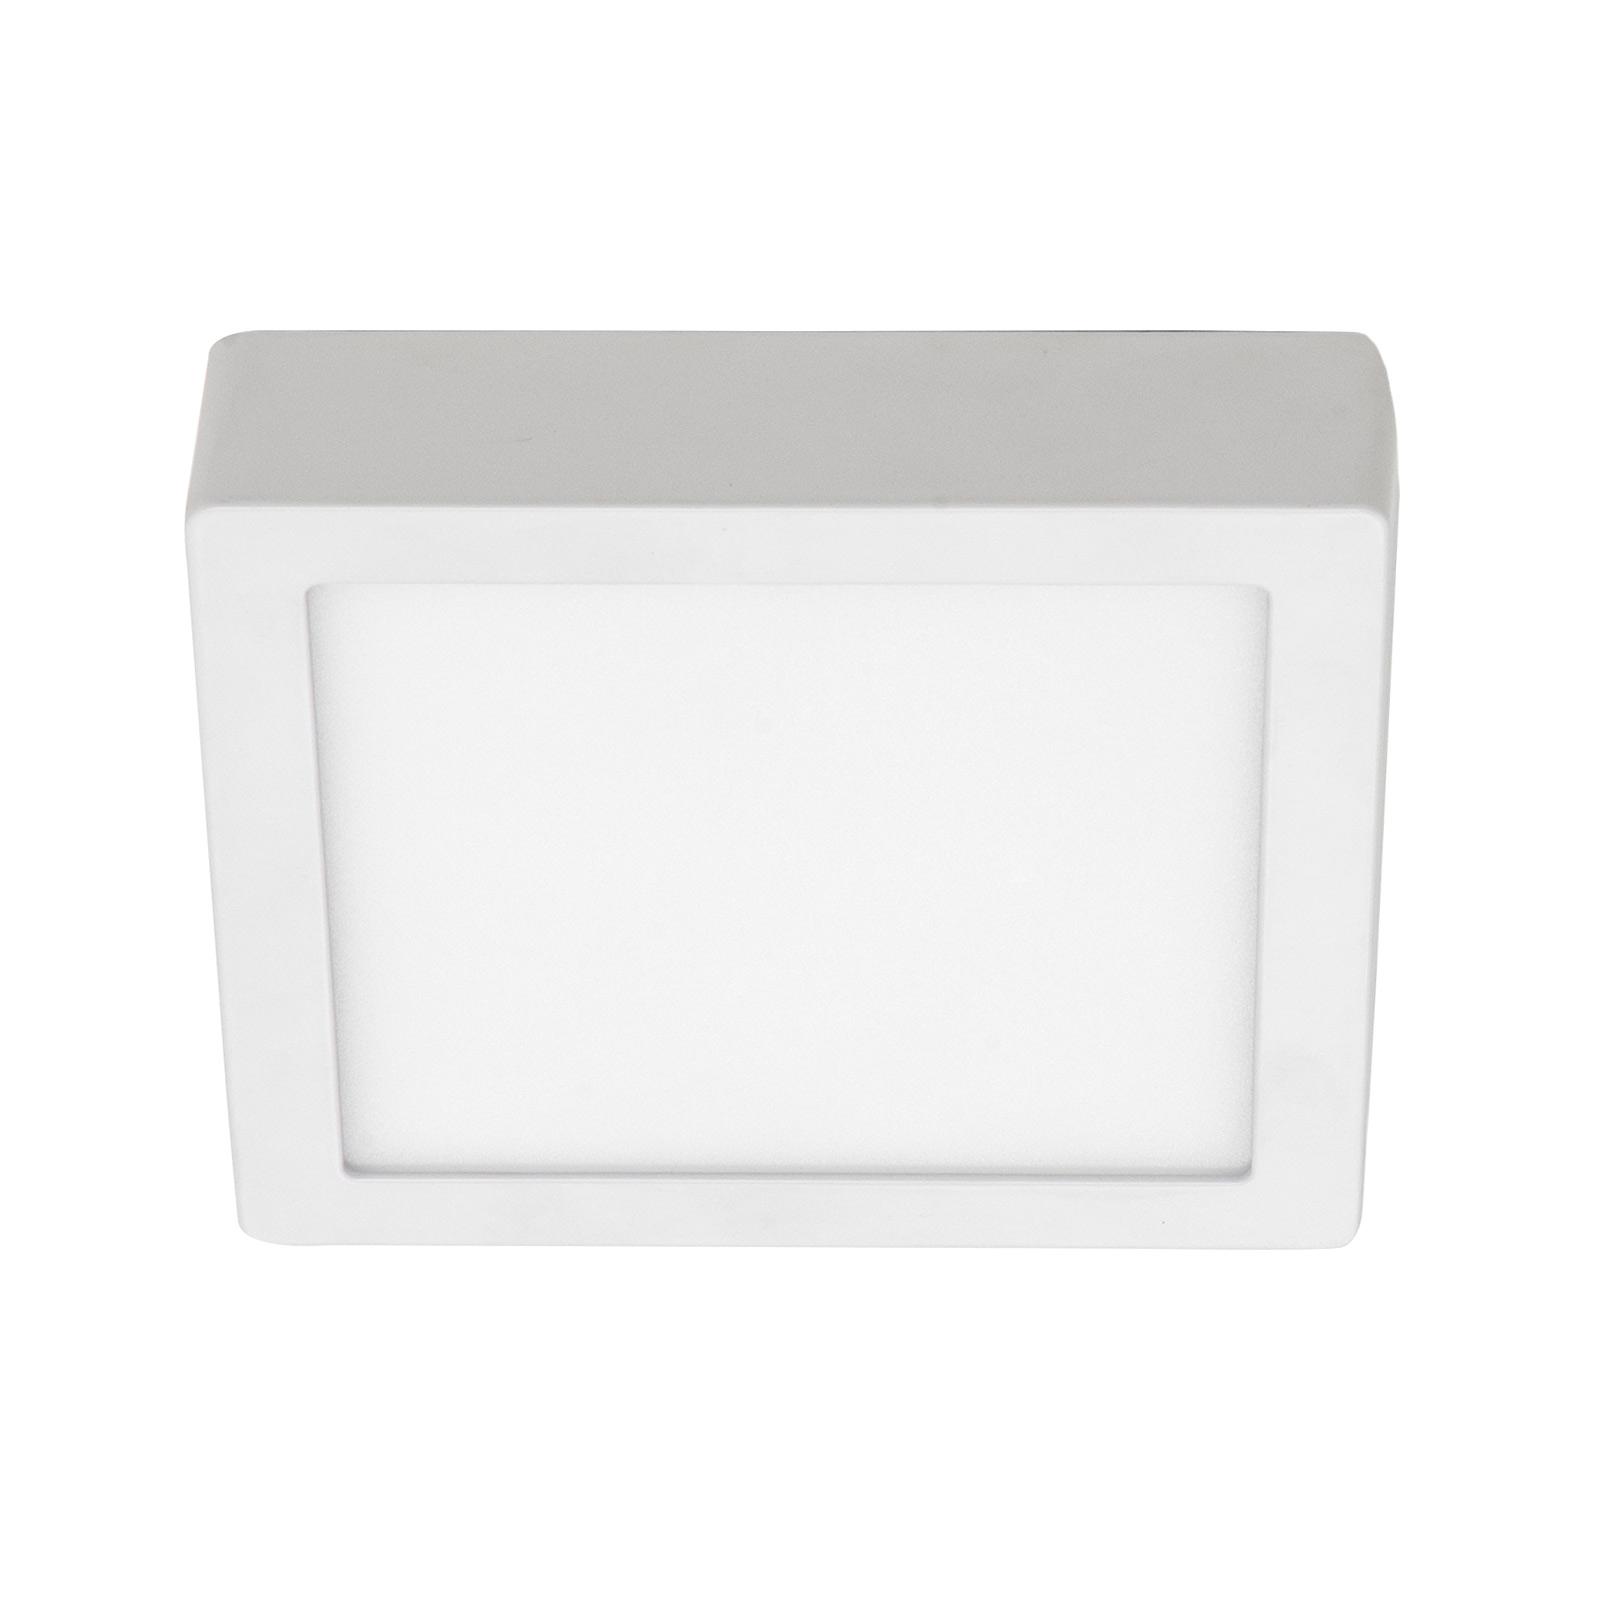 BRUMBERG Flat37 LED-Deckenpanel, eckig, 18 x 18 cm